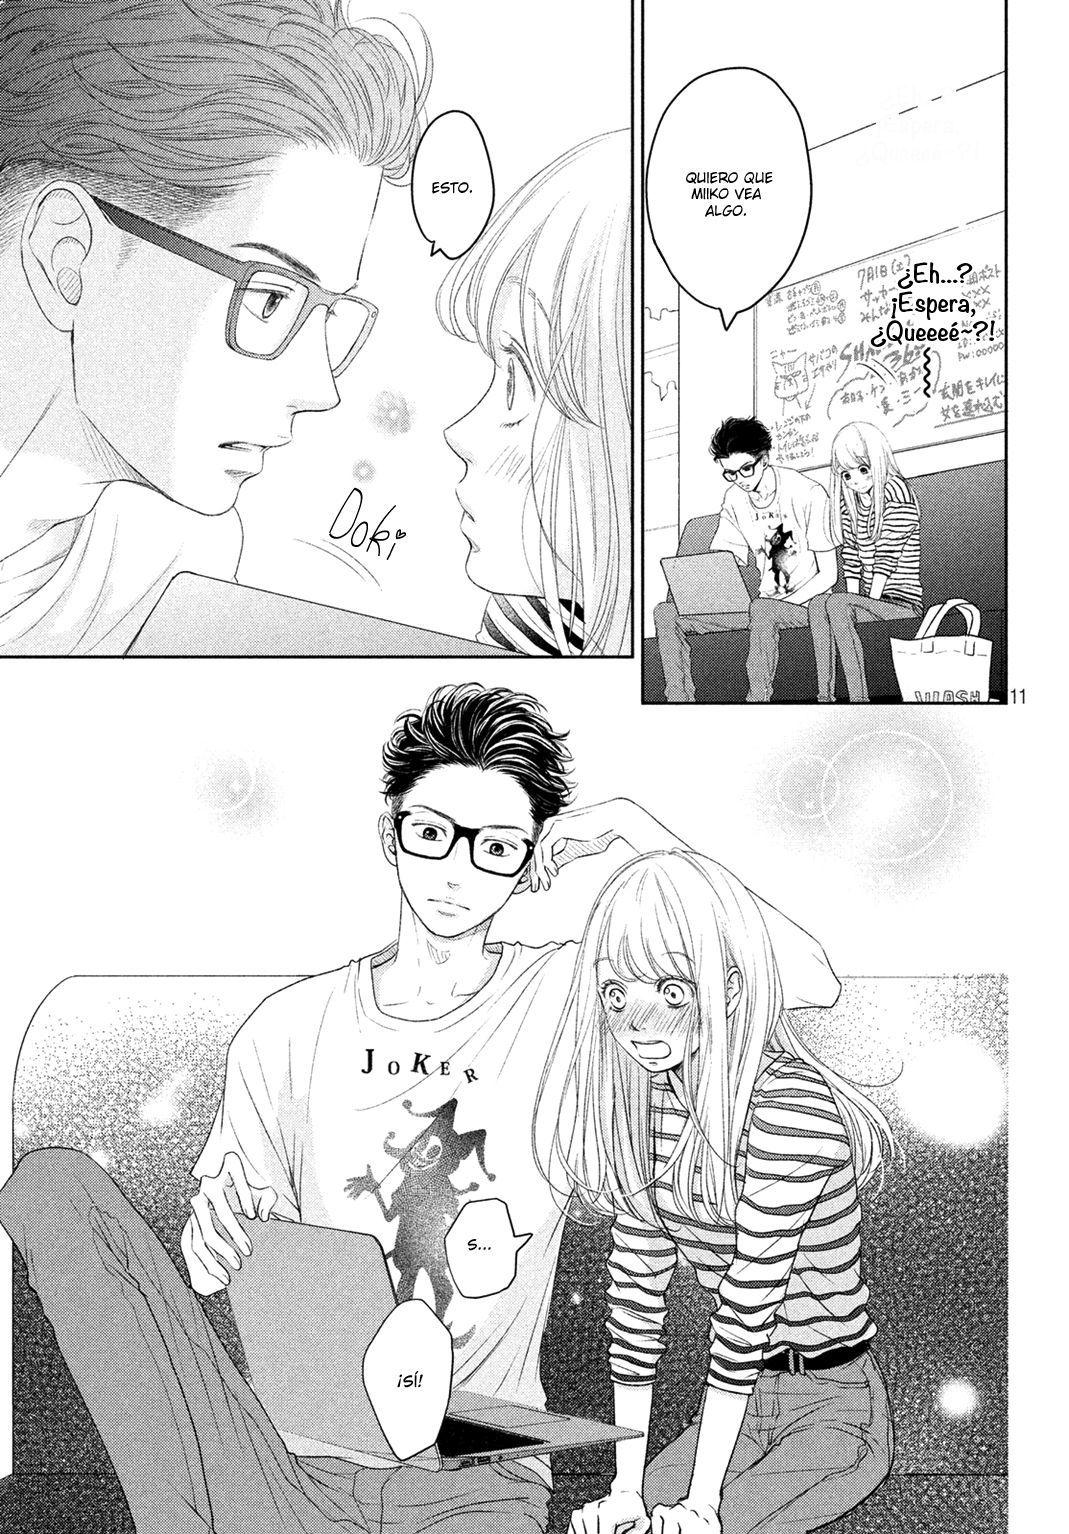 Living No Matsunaga San Manga Lector Tumangaonline Manga Cosplay Manga Shoujo Manga